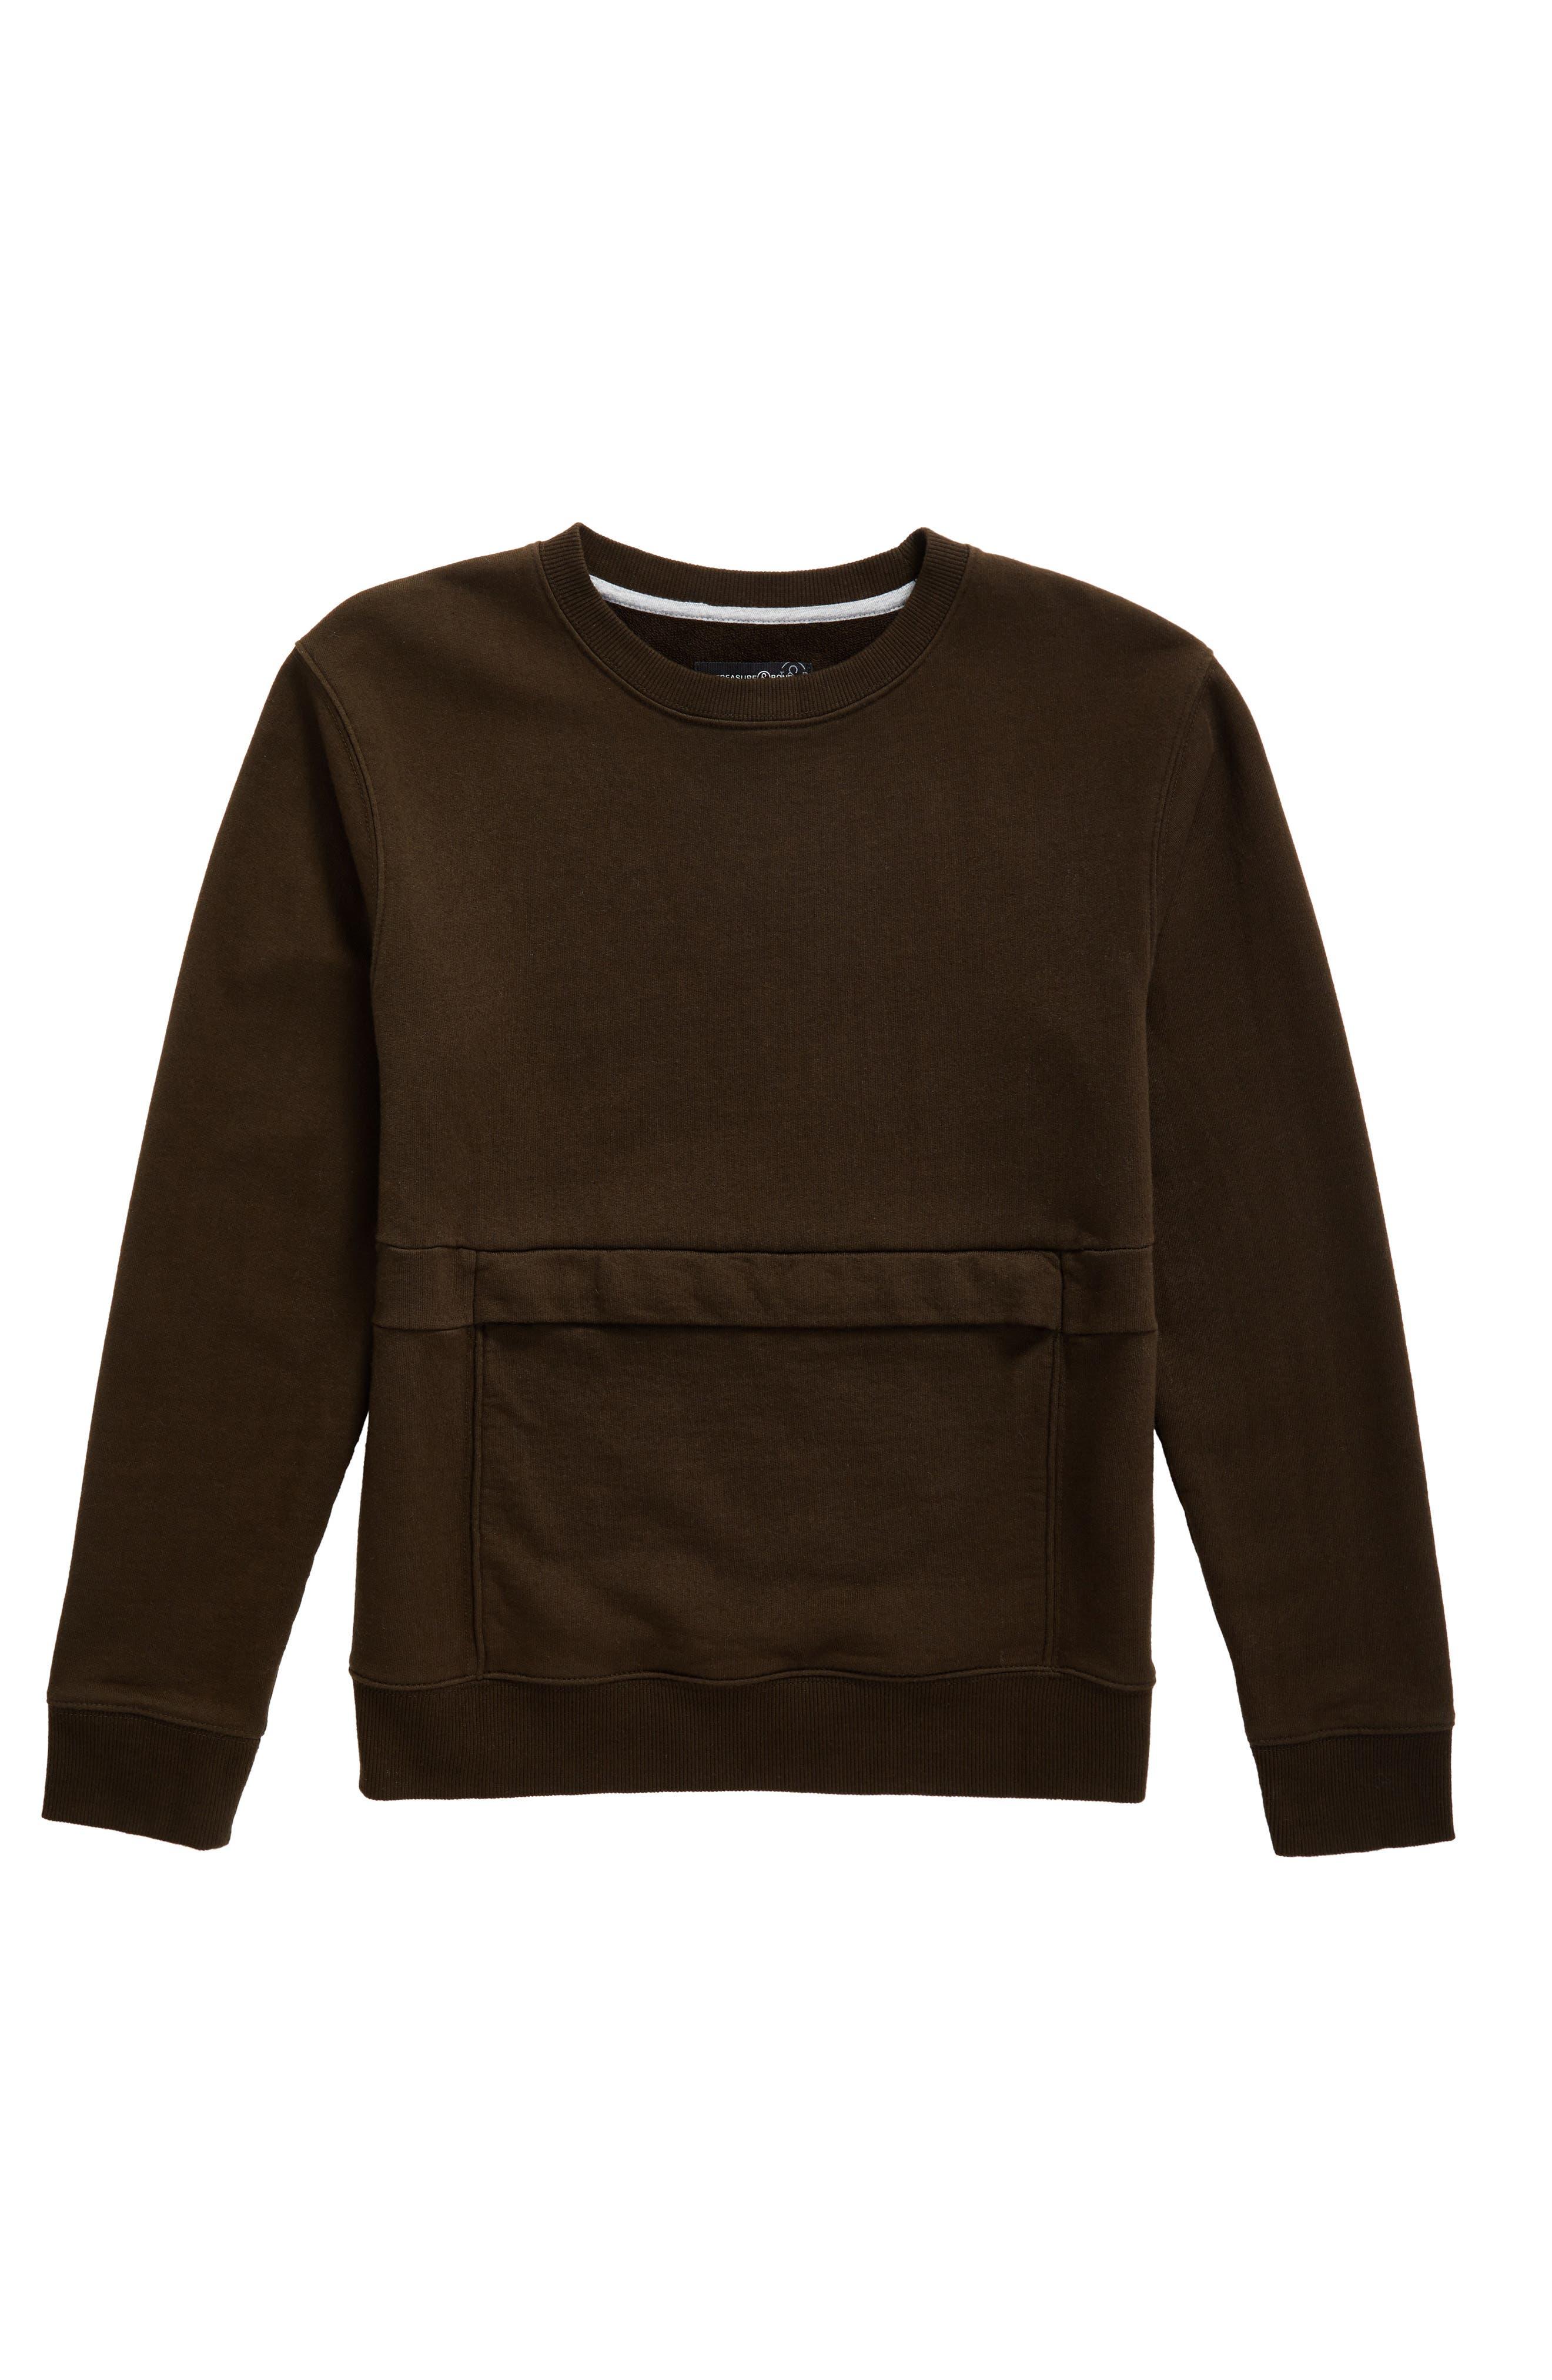 Alternate Image 1 Selected - Treasure & Bond Pouch Pocket Sweatshirt (Big Boys)